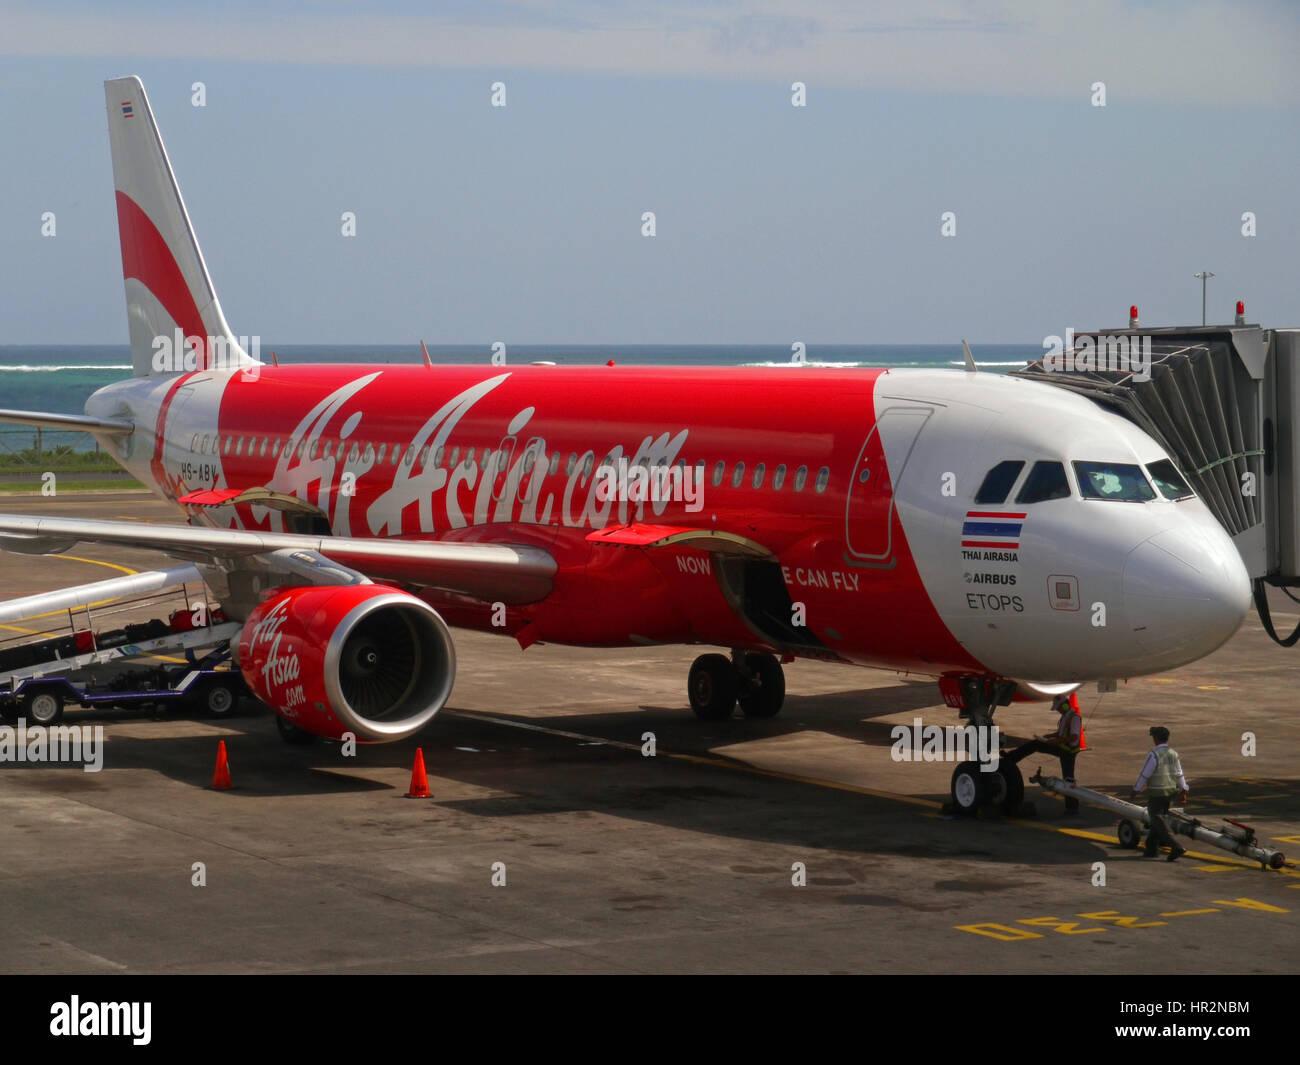 Aeroporto Bali : Air asia airbus avião no aeroporto internacional ngurah rai dps